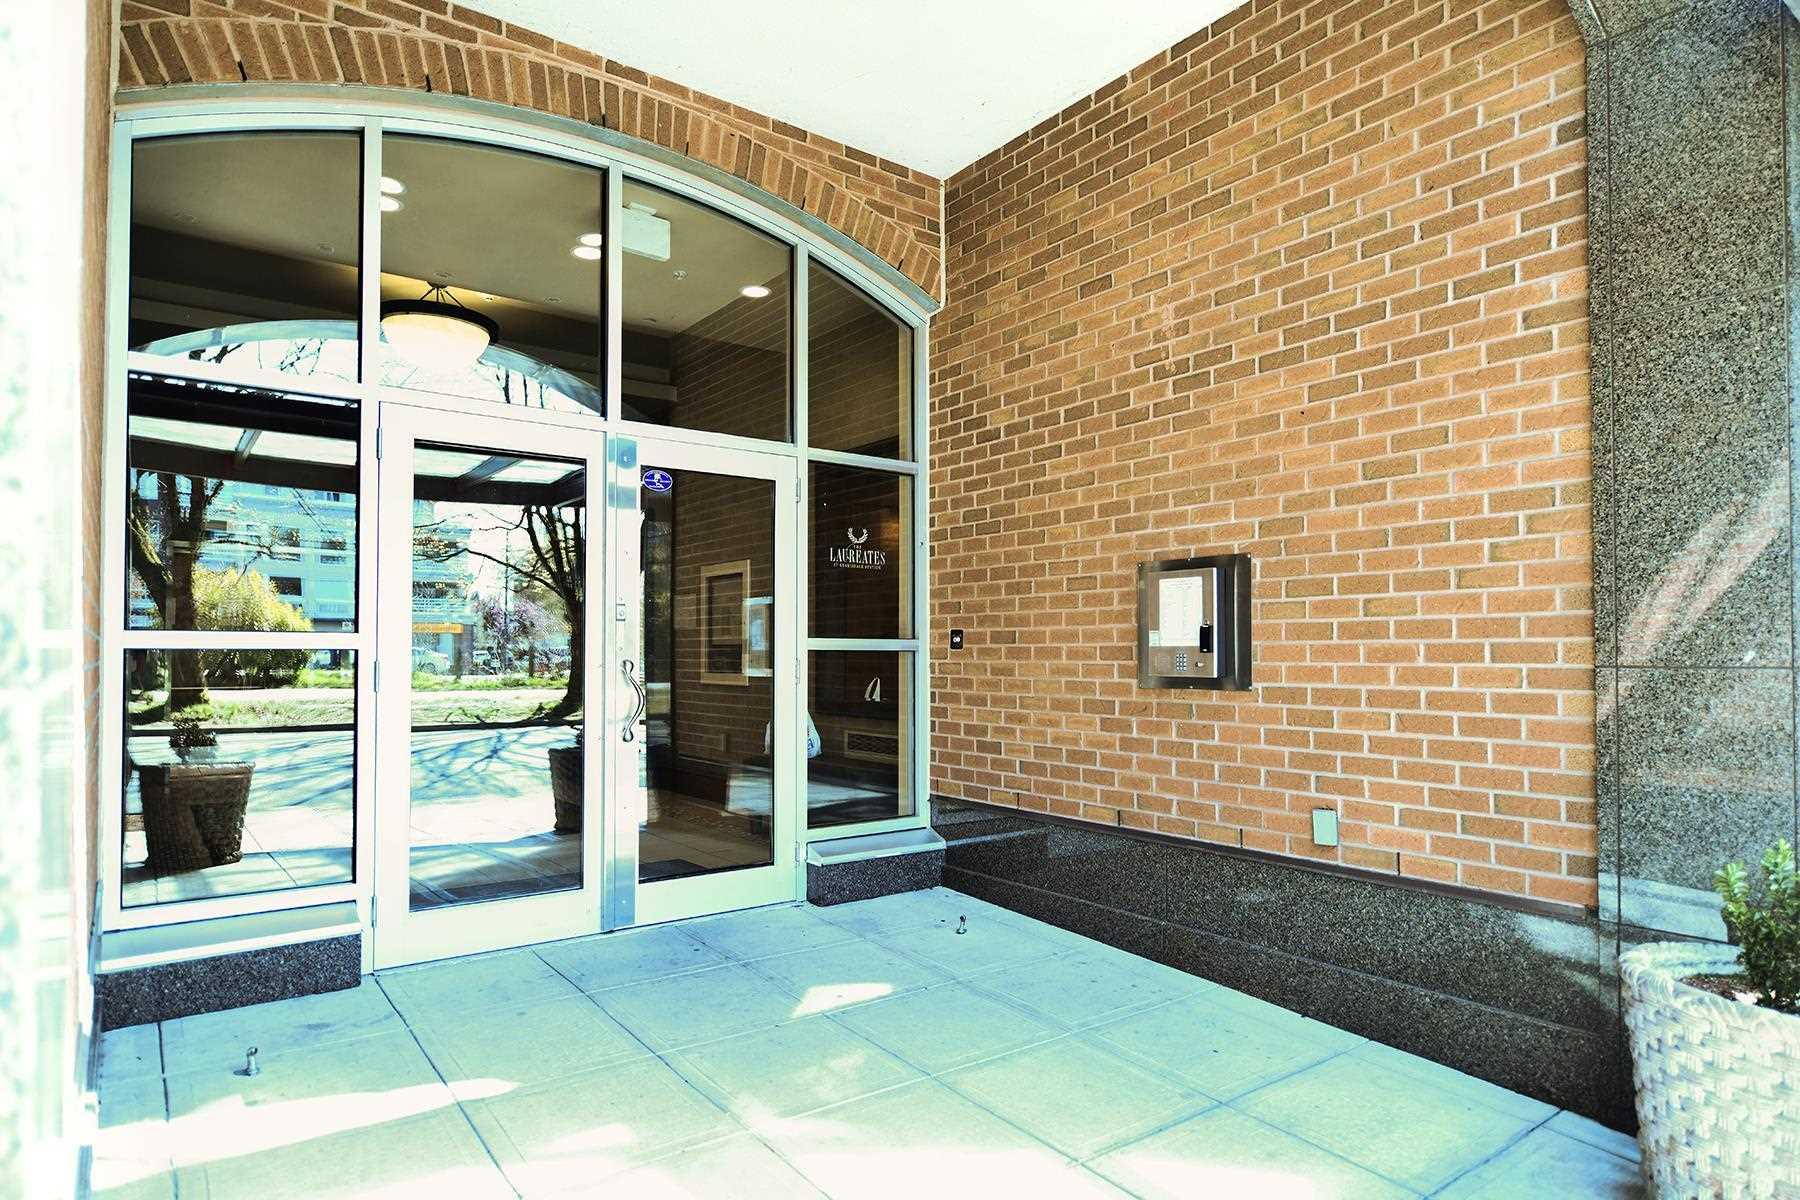 204 5790 EAST BOULEVARD - Kerrisdale Apartment/Condo for sale, 3 Bedrooms (R2604138) - #28